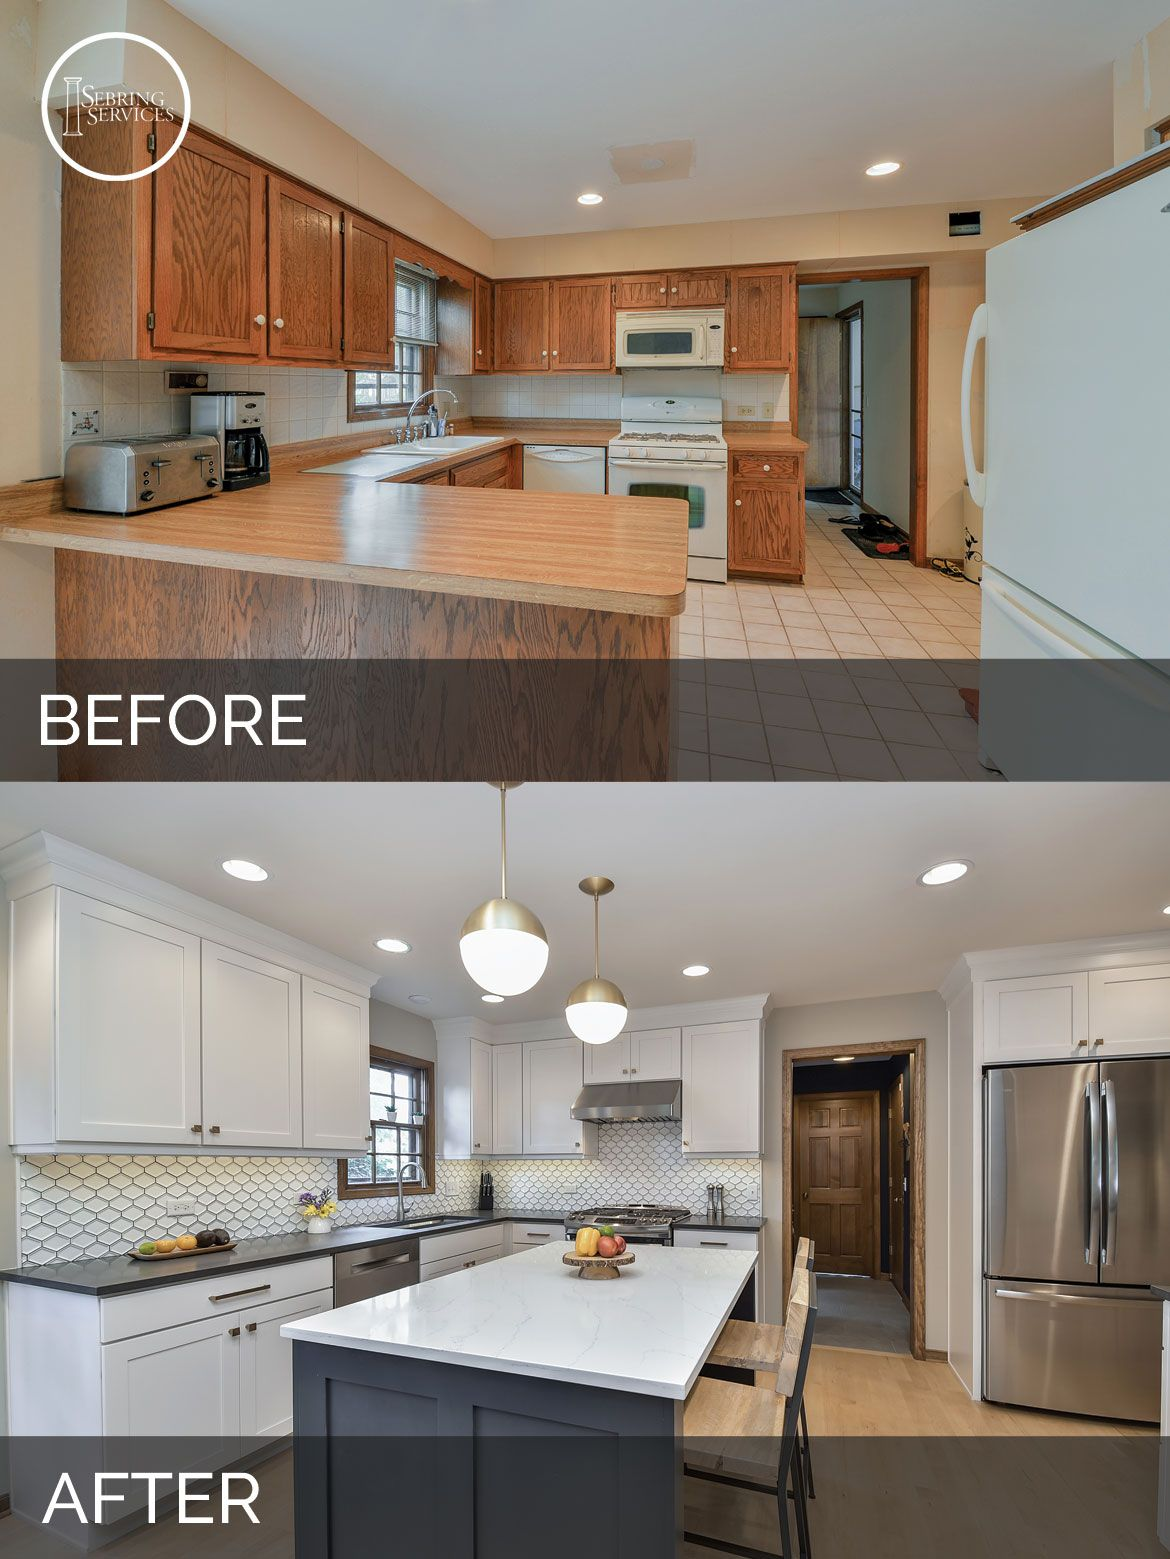 Justin Carina S Kitchen Before After Pictures Diy Kitchen Renovation Kitchen Diy Makeover Diy Kitchen Remodel